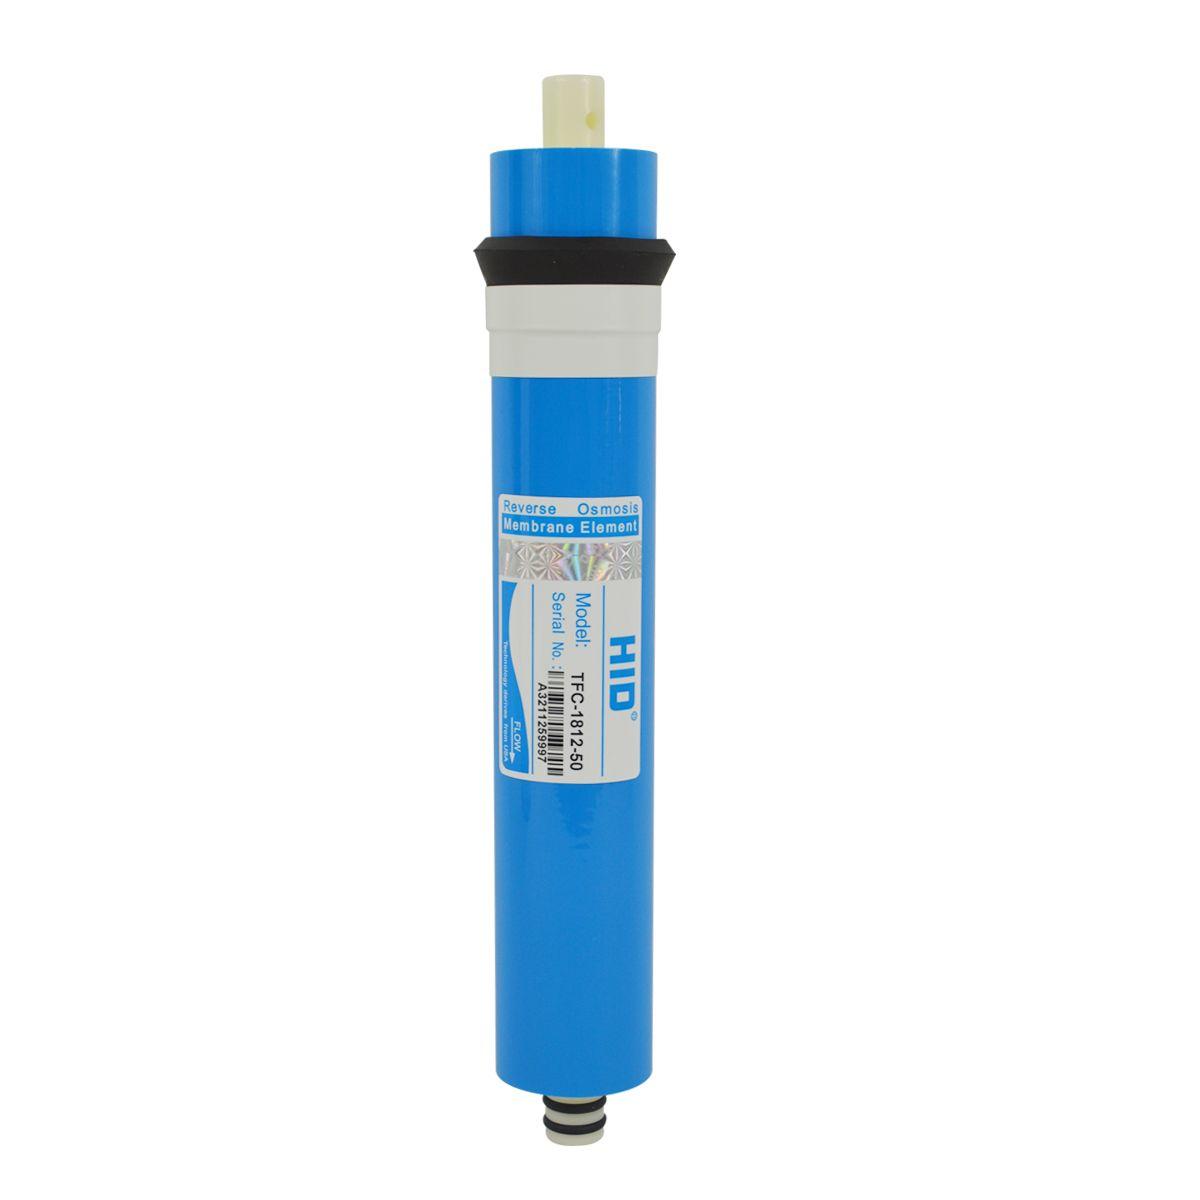 Membrane Cartridge Reverse Osmosis Filtration Water Filter Housing 1812-75GPD